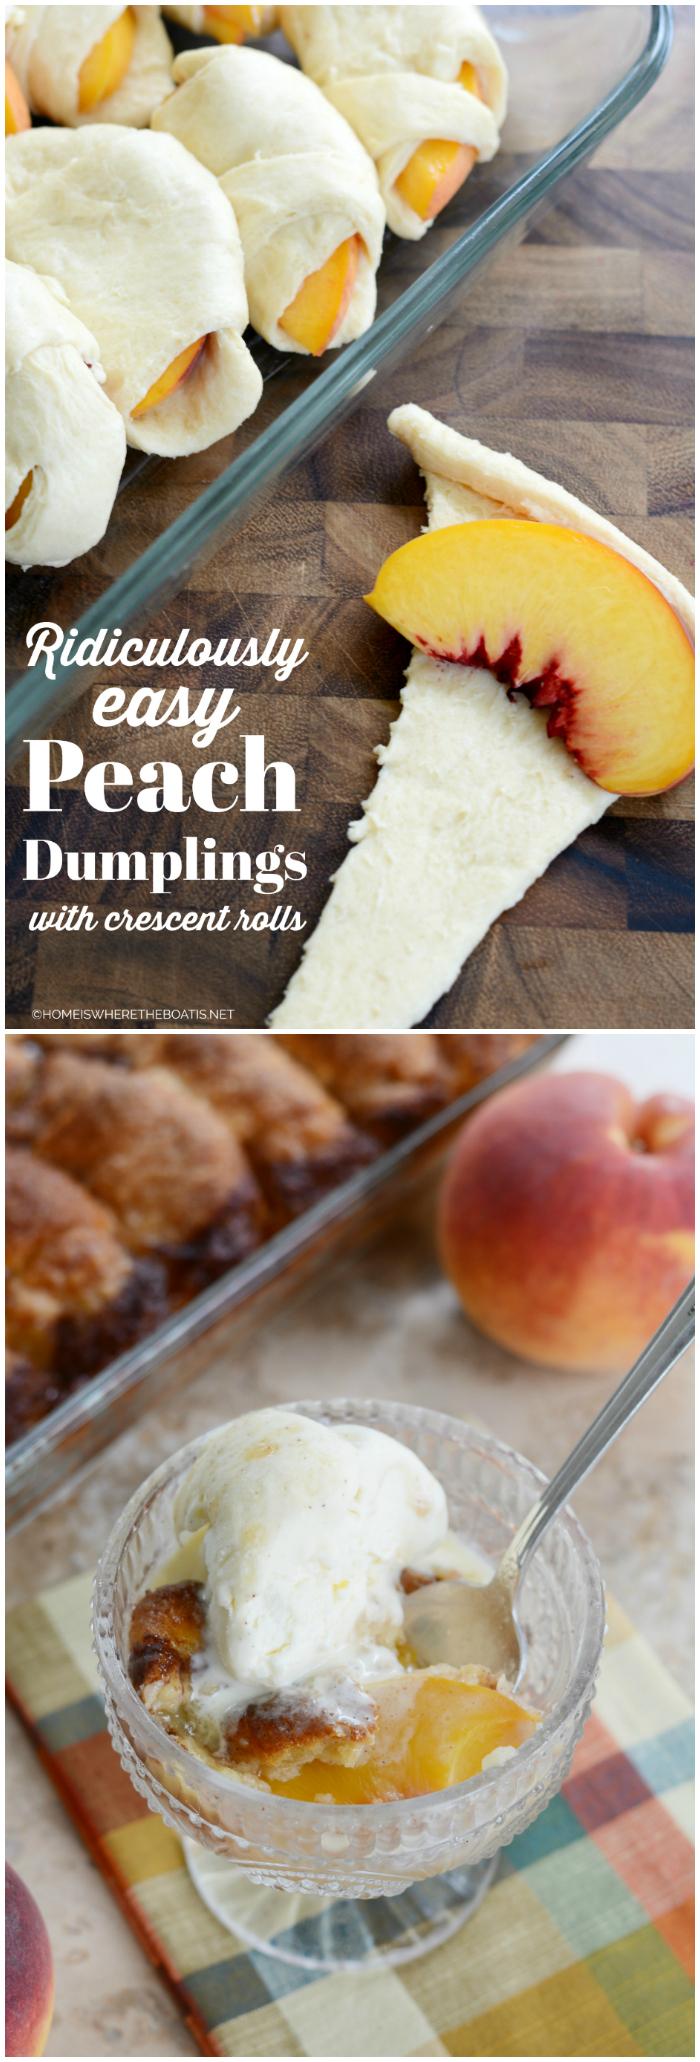 Ridiculously Easy Peach Dumplings | ©homeiswheretheboatis.net #easy #summer #peach #recipes #desserts